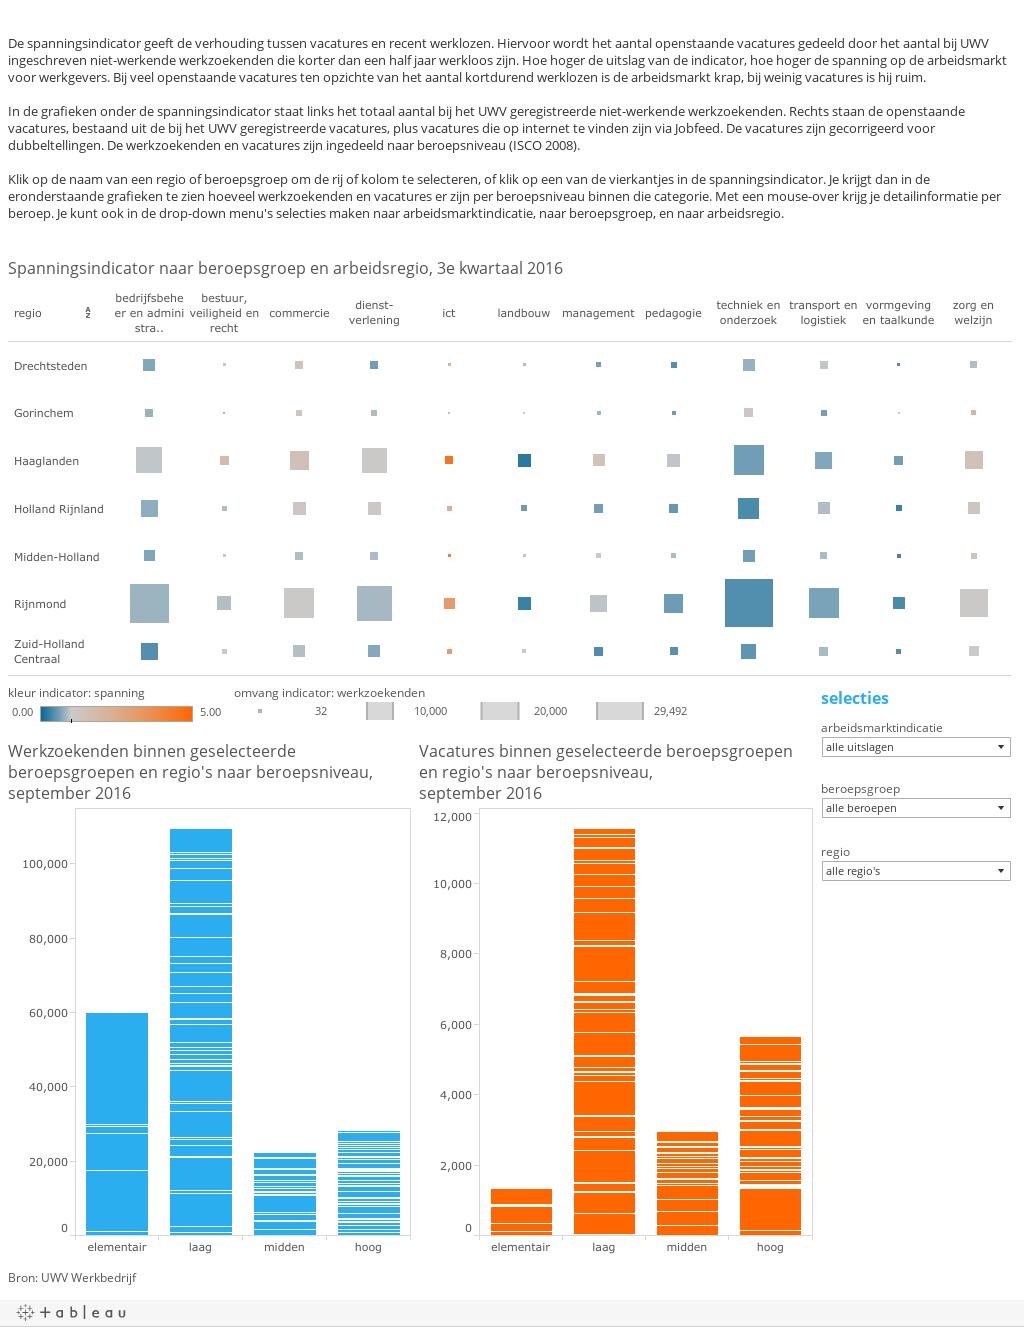 Factsheet spanningsindicator arbeidsmarkt